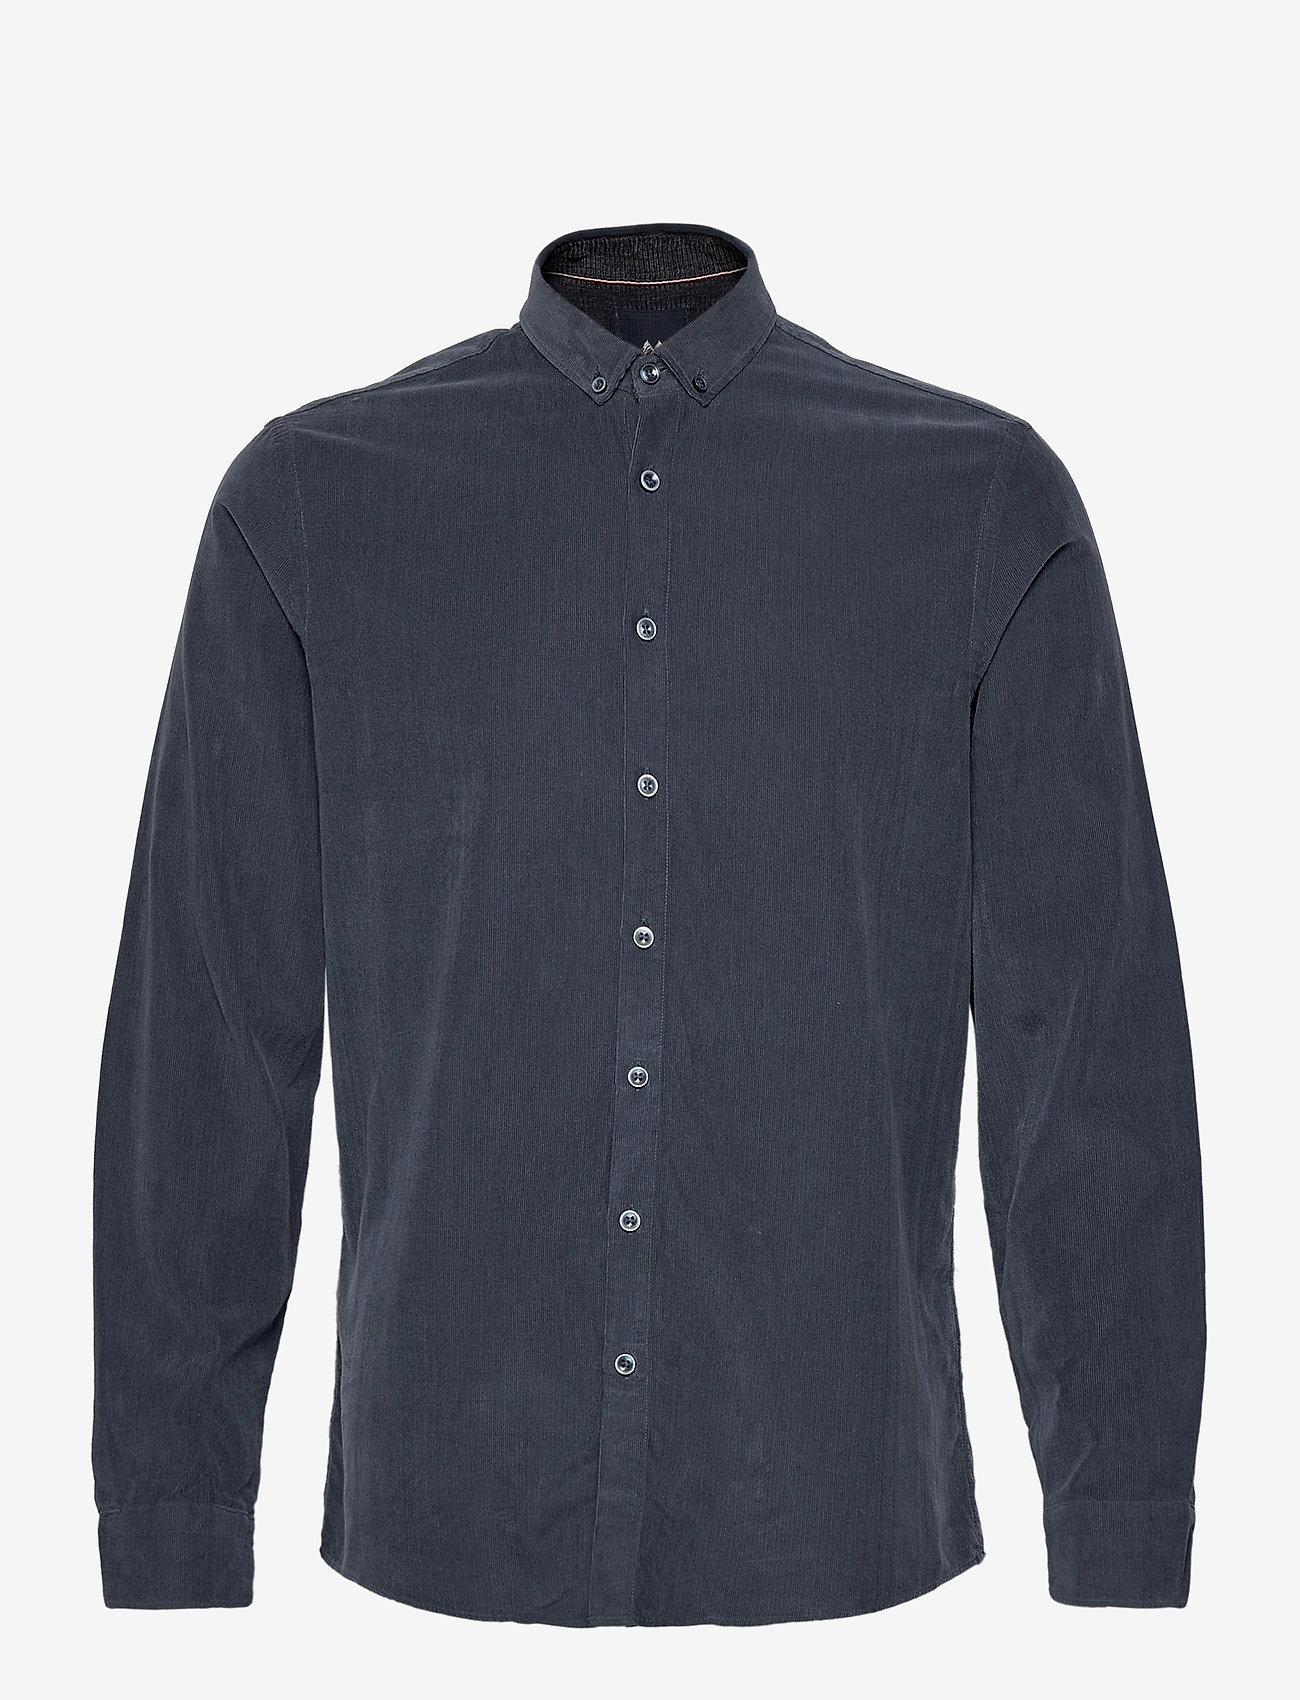 Lindbergh - L/S corduroy shirt - peruspaitoja - navy - 1